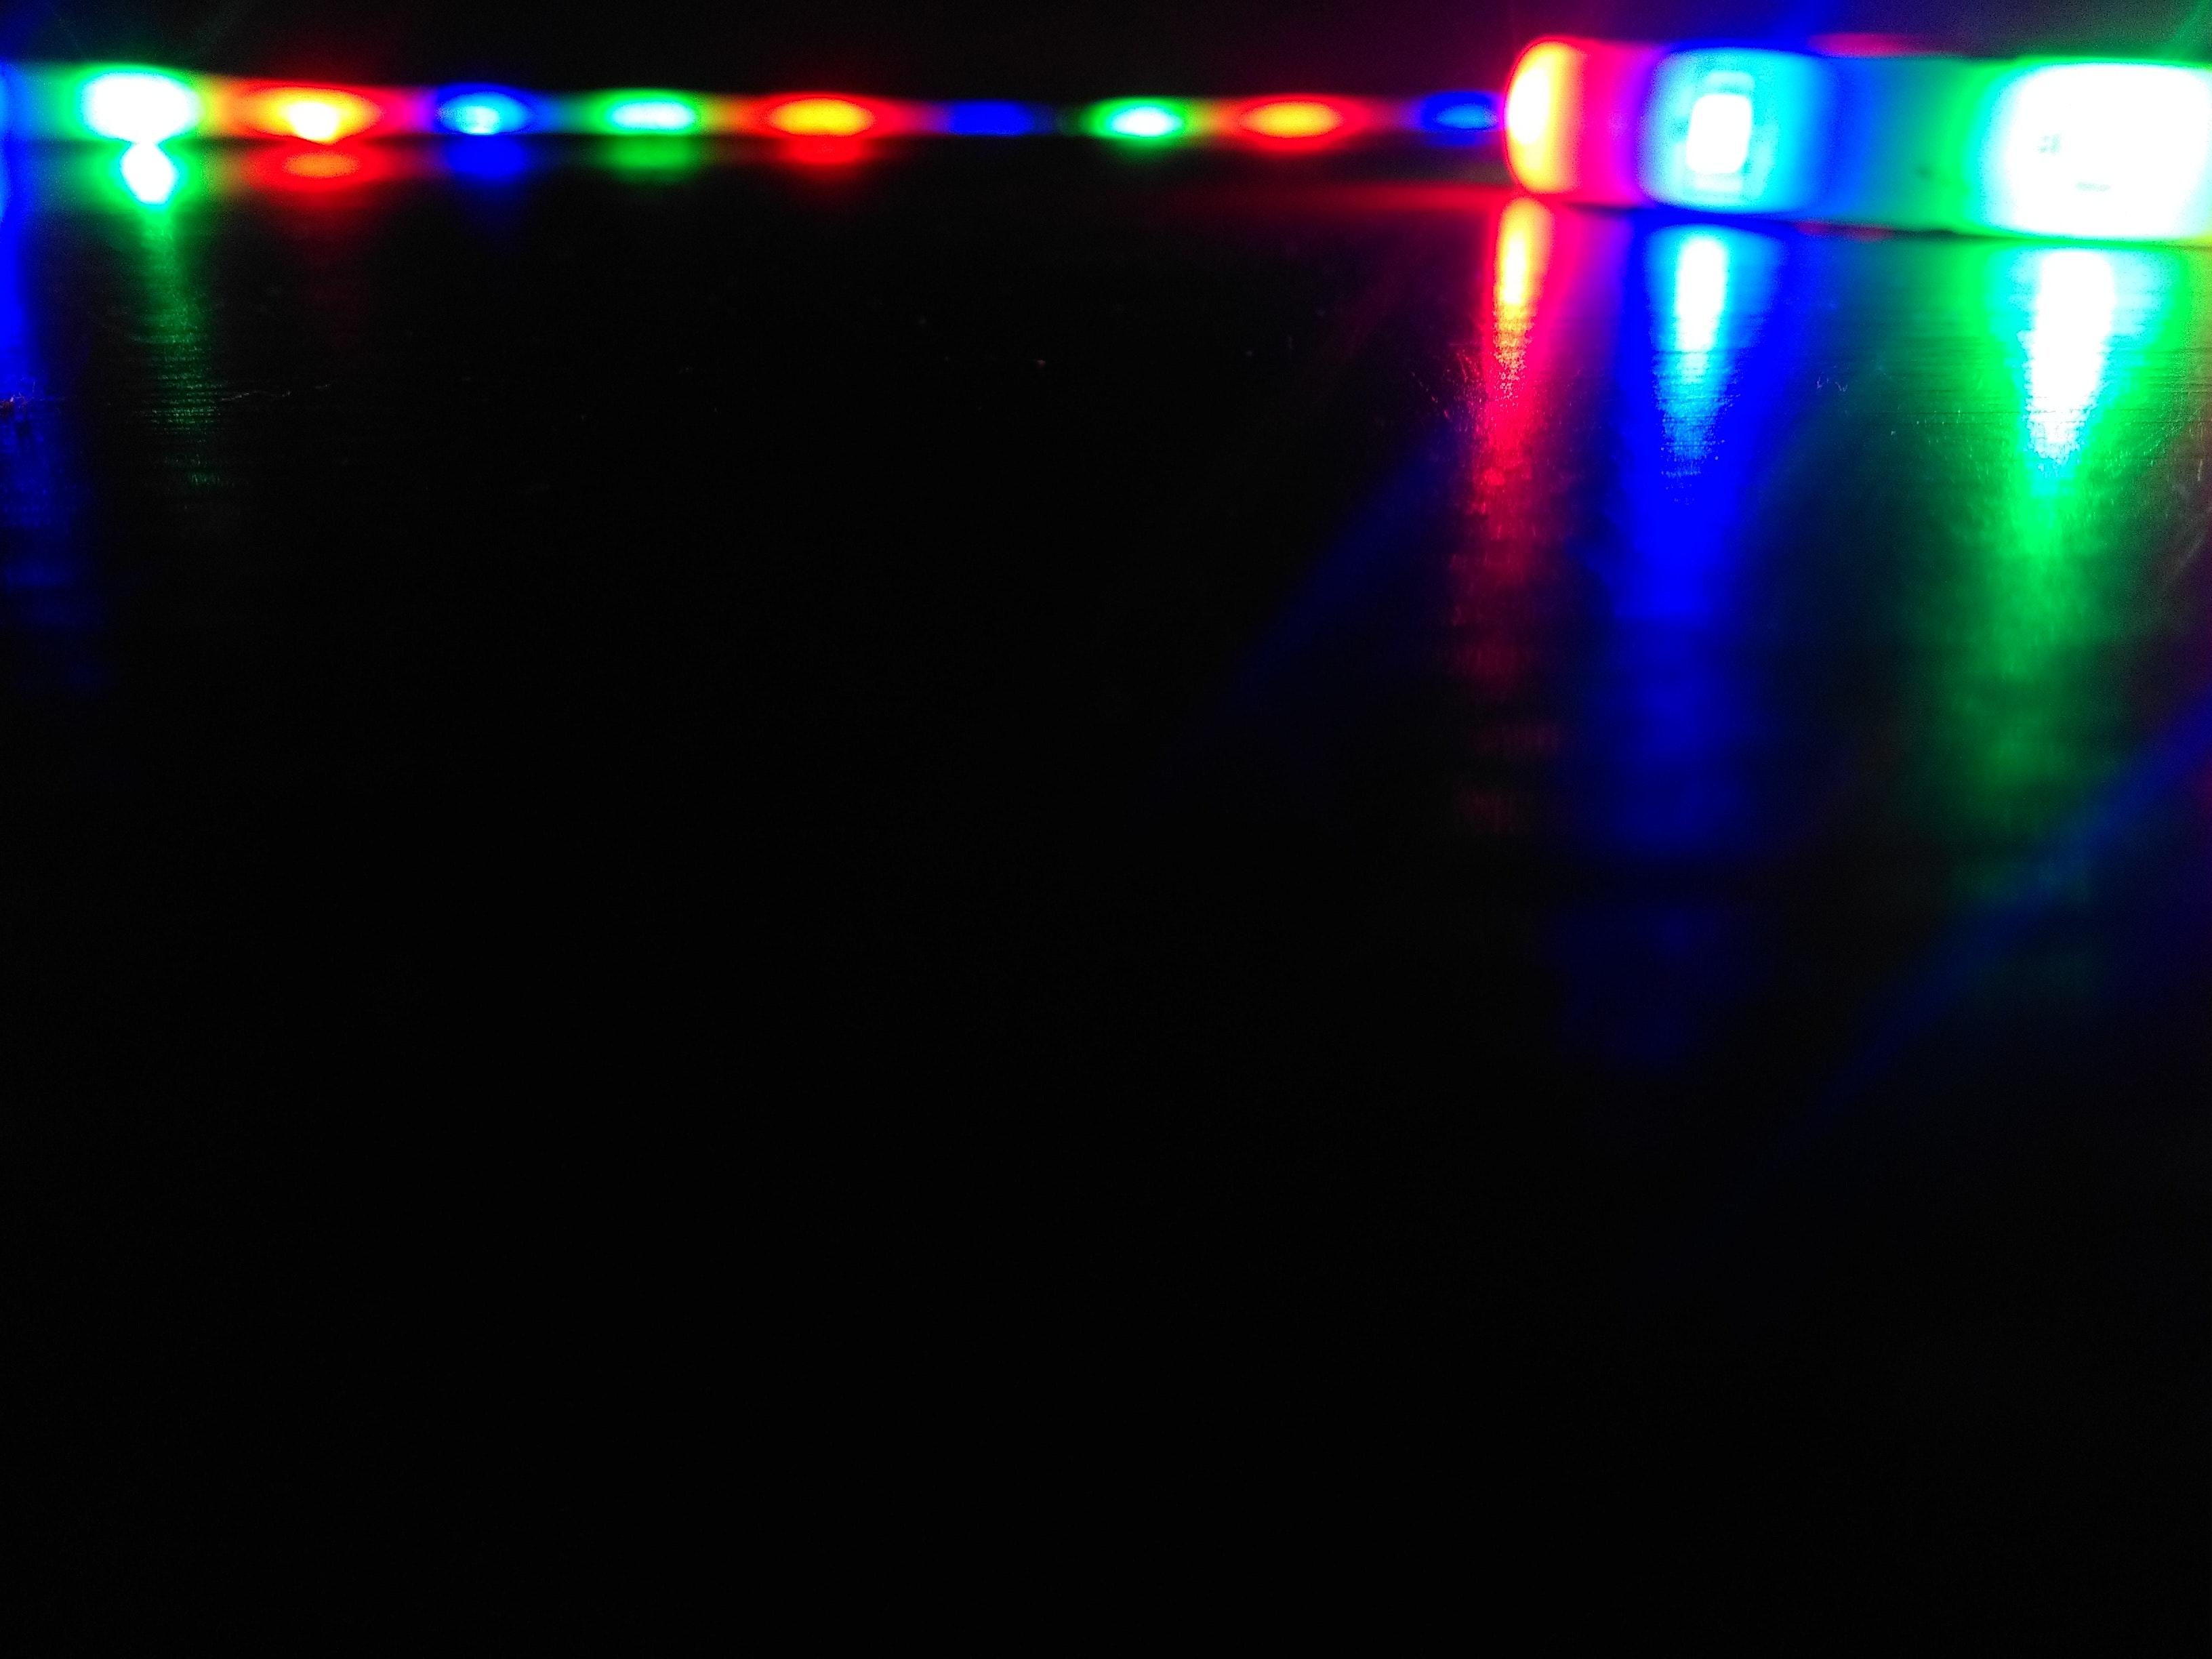 Kostenloses Foto zum Thema: led lichter, rgb